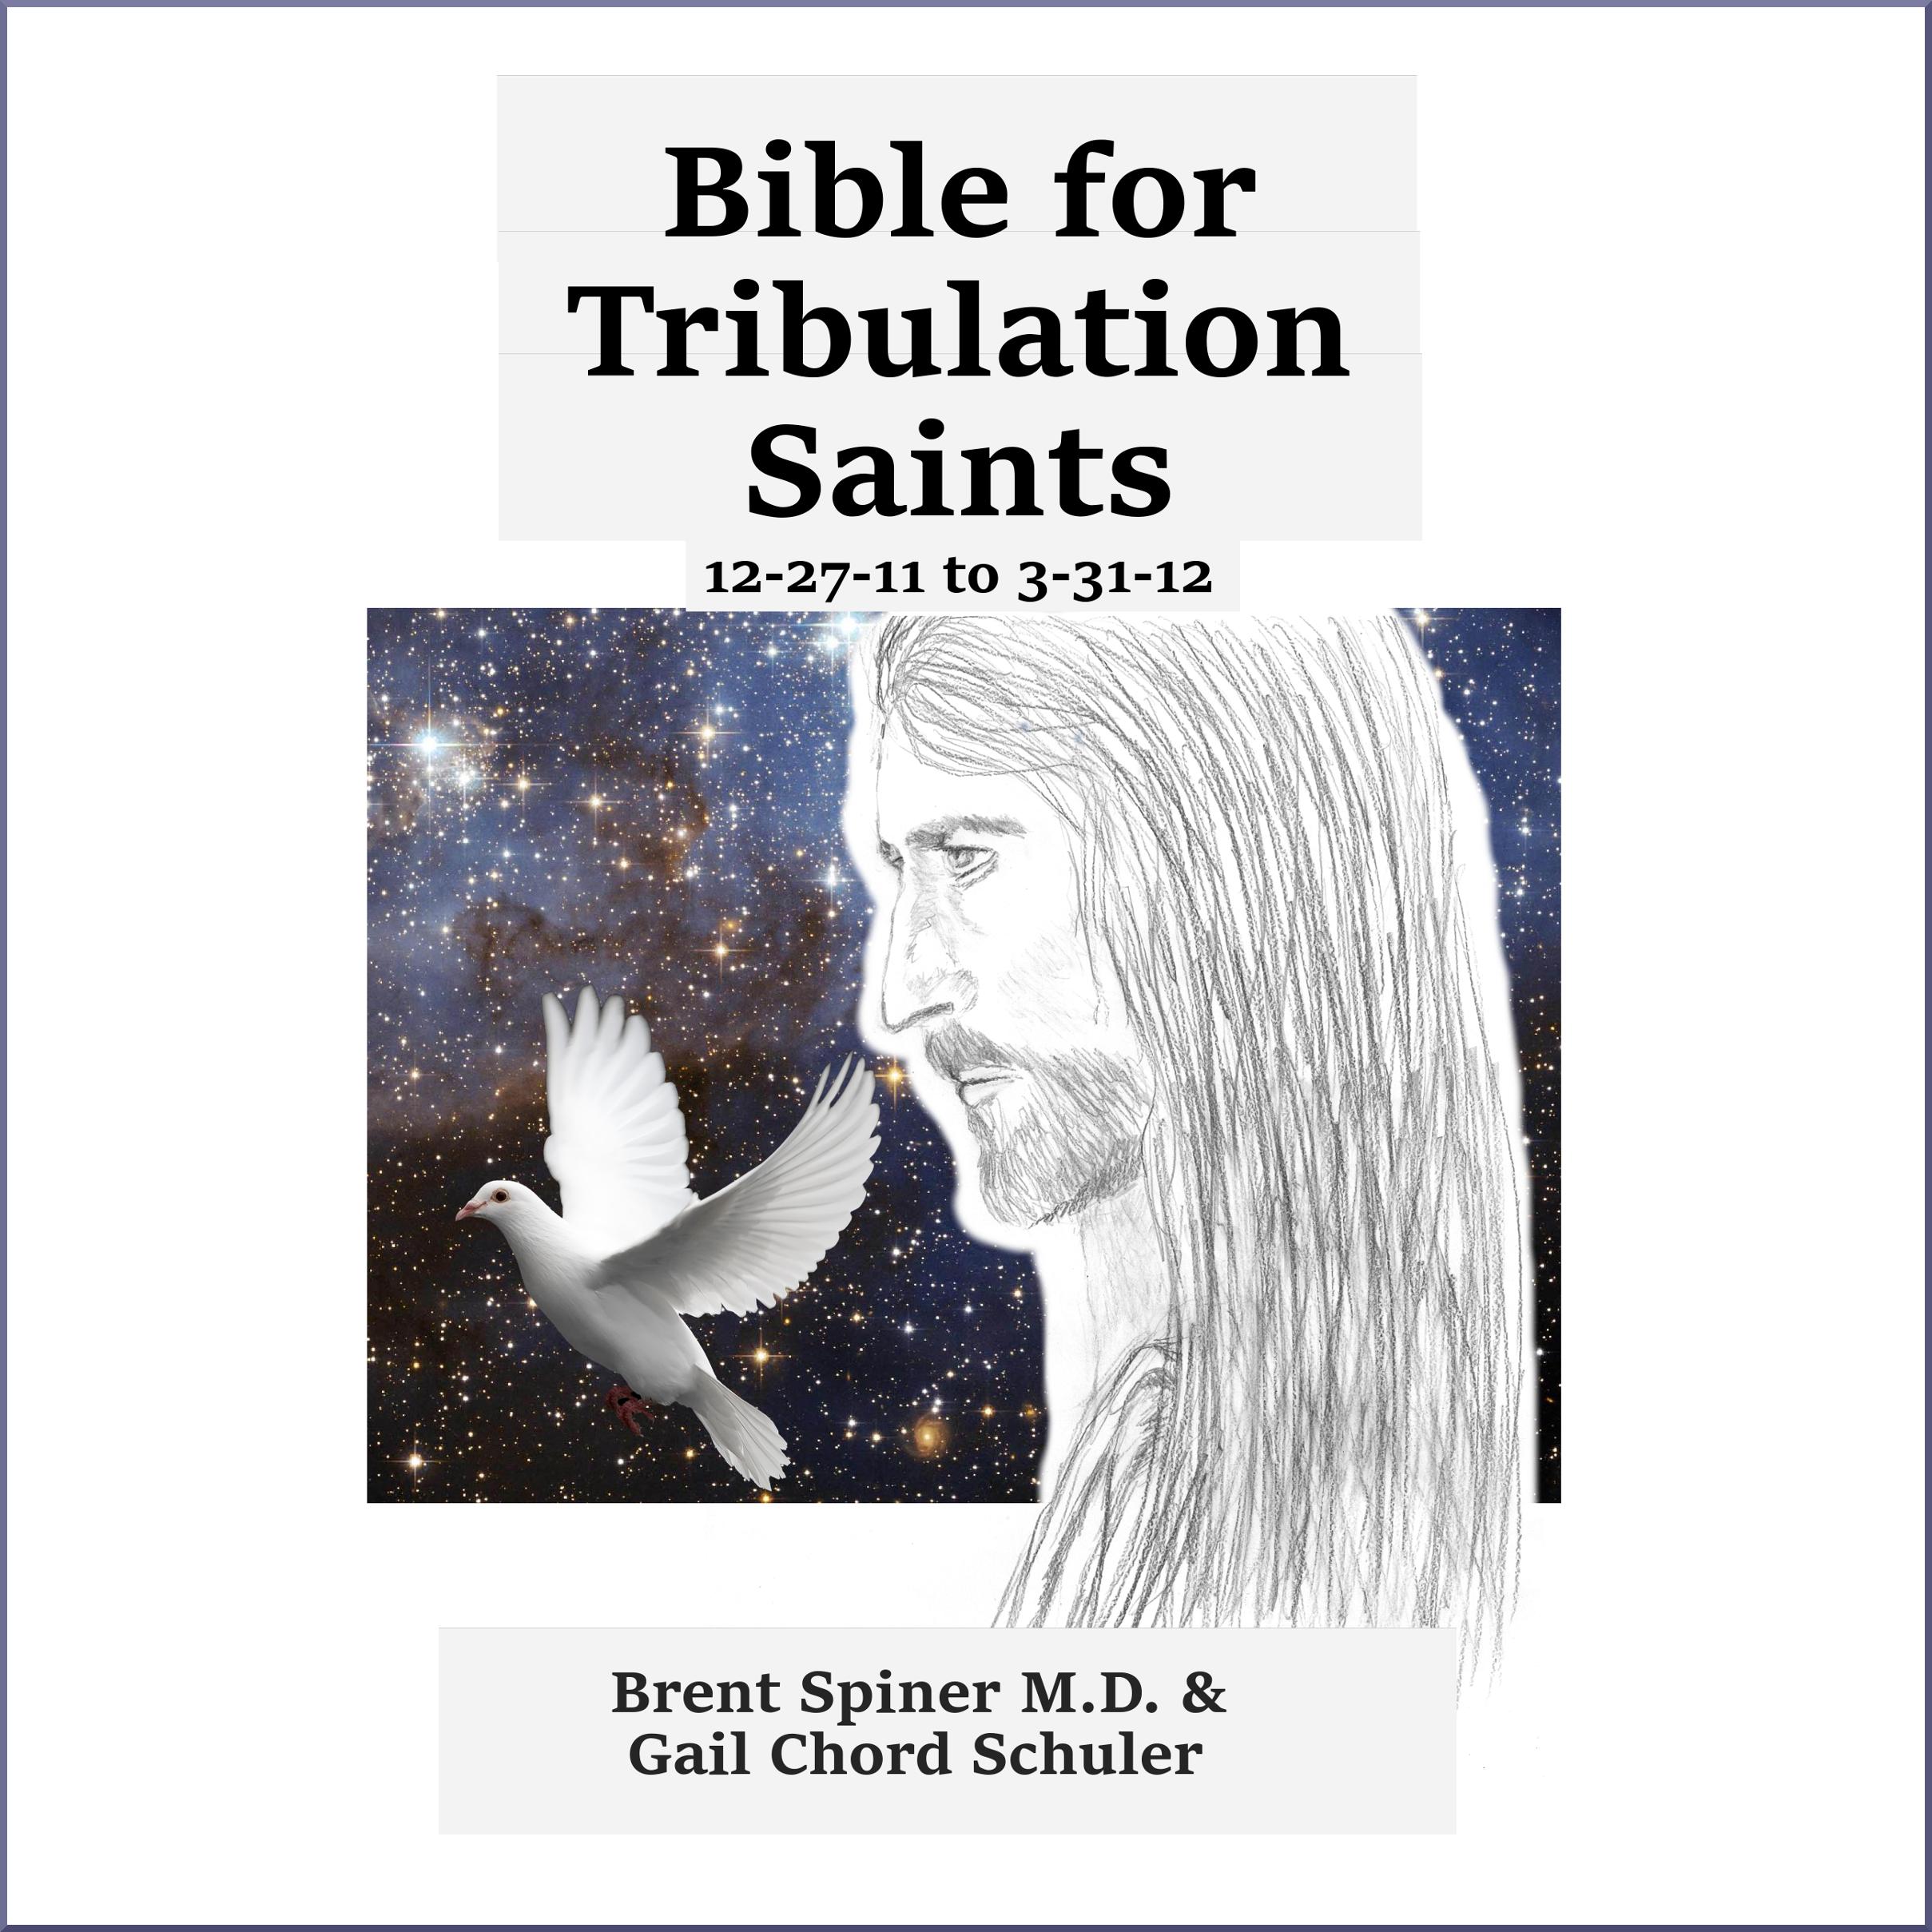 bible-for-trib-saints-12-27-11-to-3-31-12-acx-border